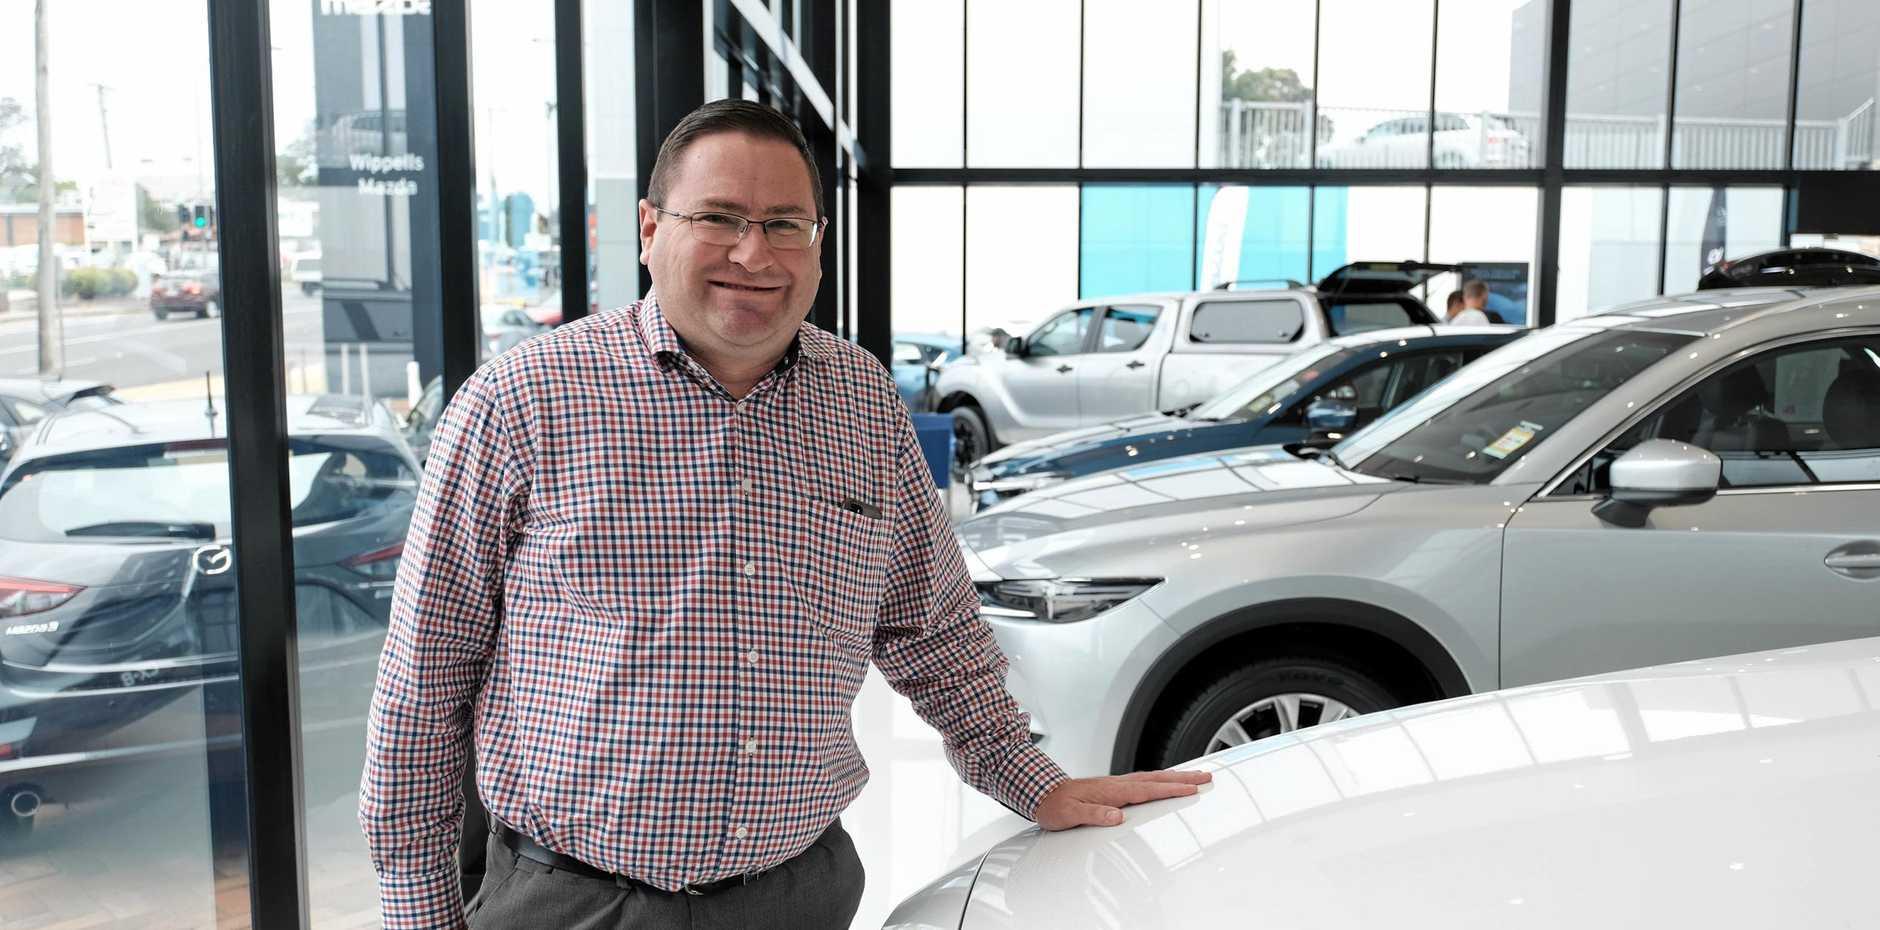 PLEASED: Wippells Mazda dealer principal David Russell, inside the new Wippells Mazda showroom on Herries St.